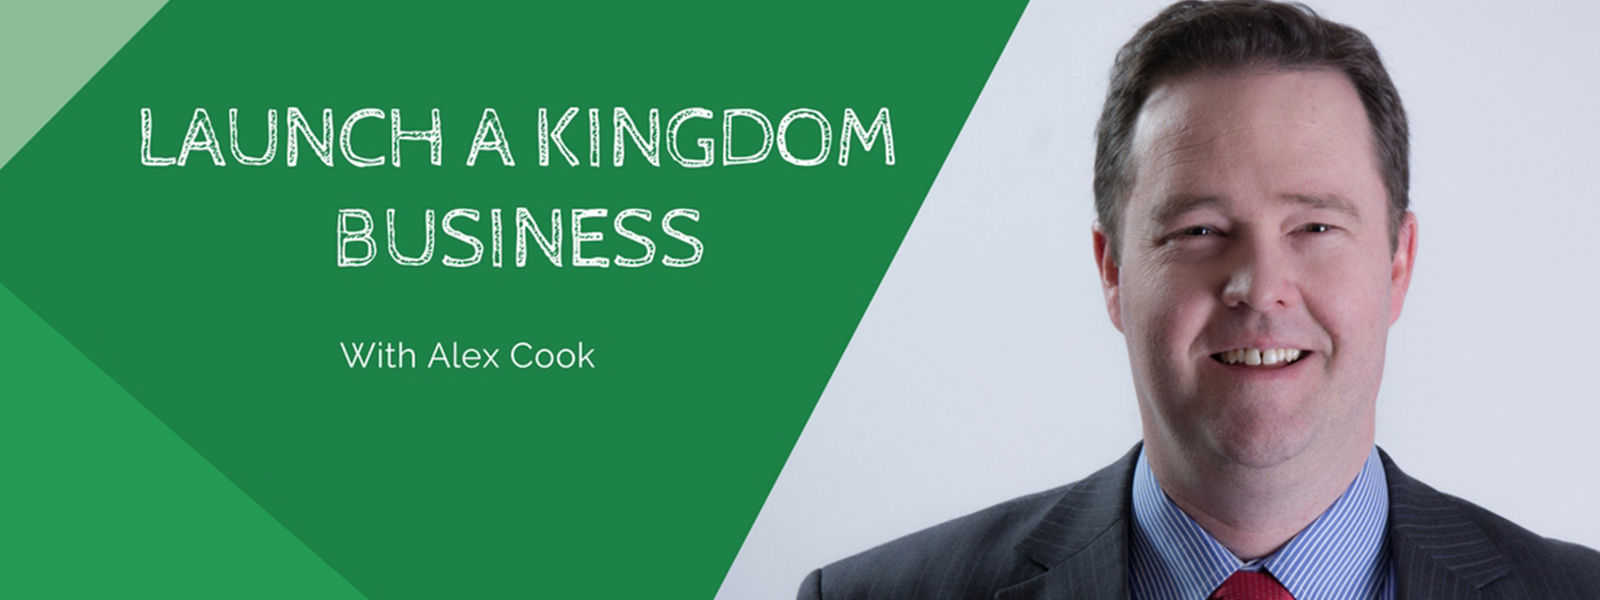 Kingdom Business Launch